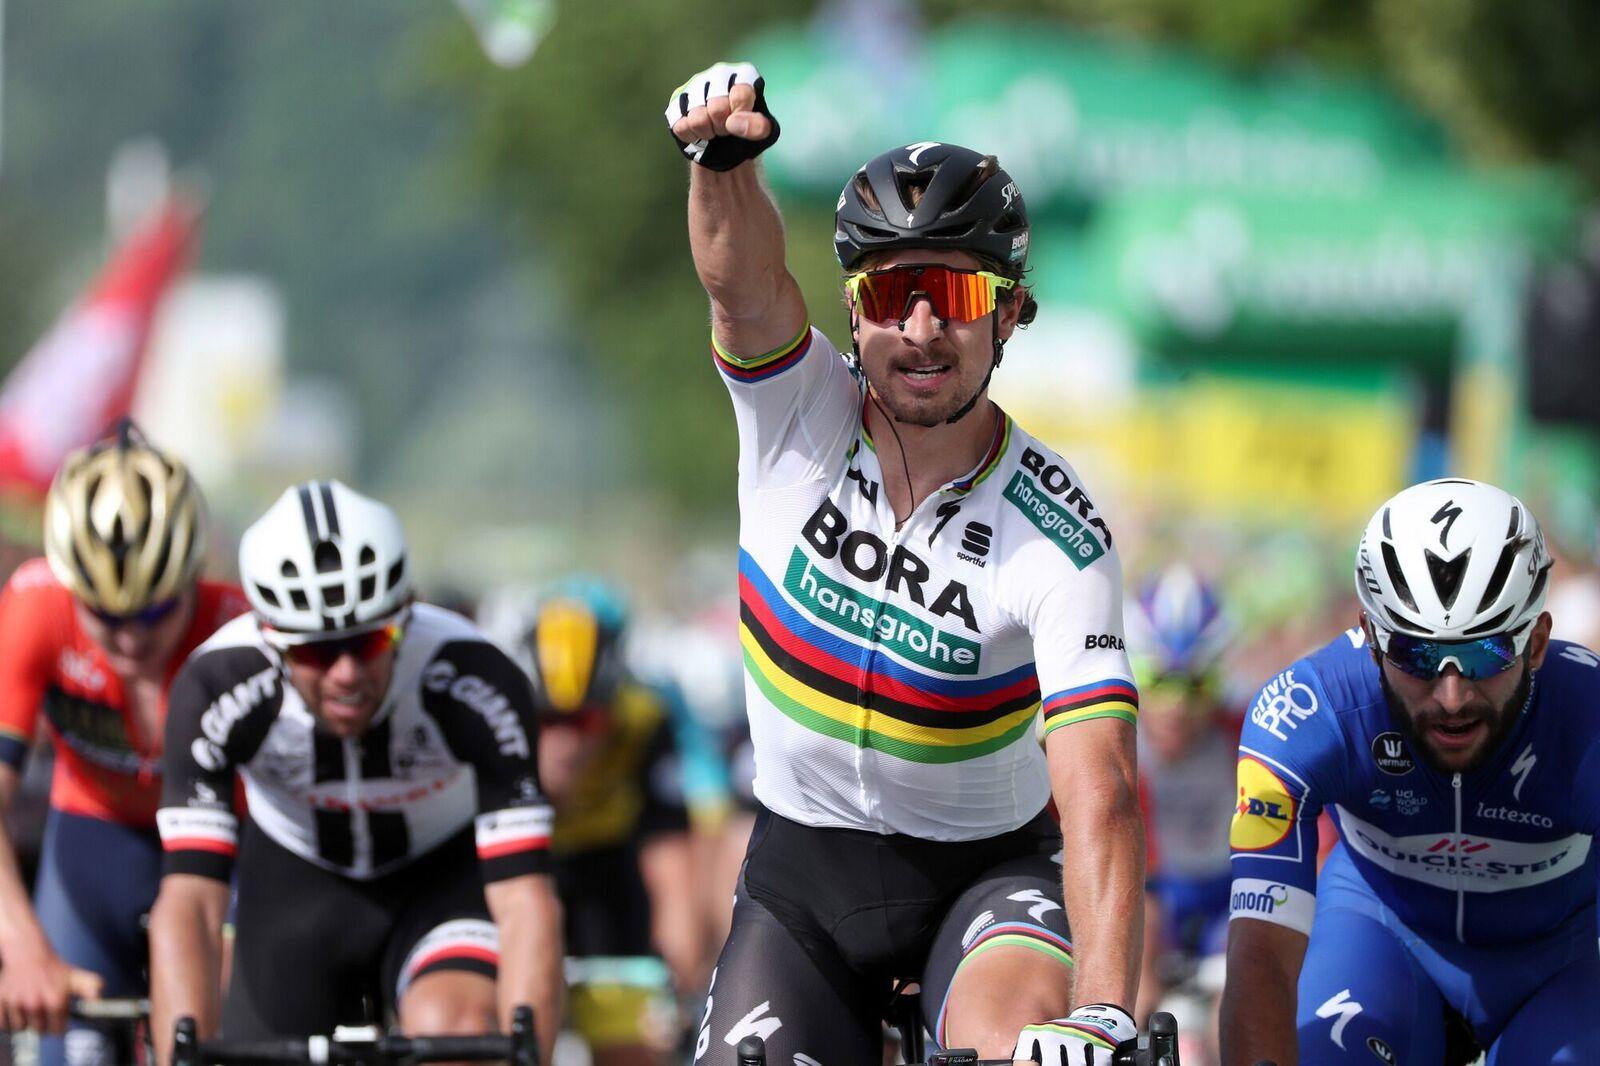 Peter Sagan vince la seconda tappa del Tour de Suisse